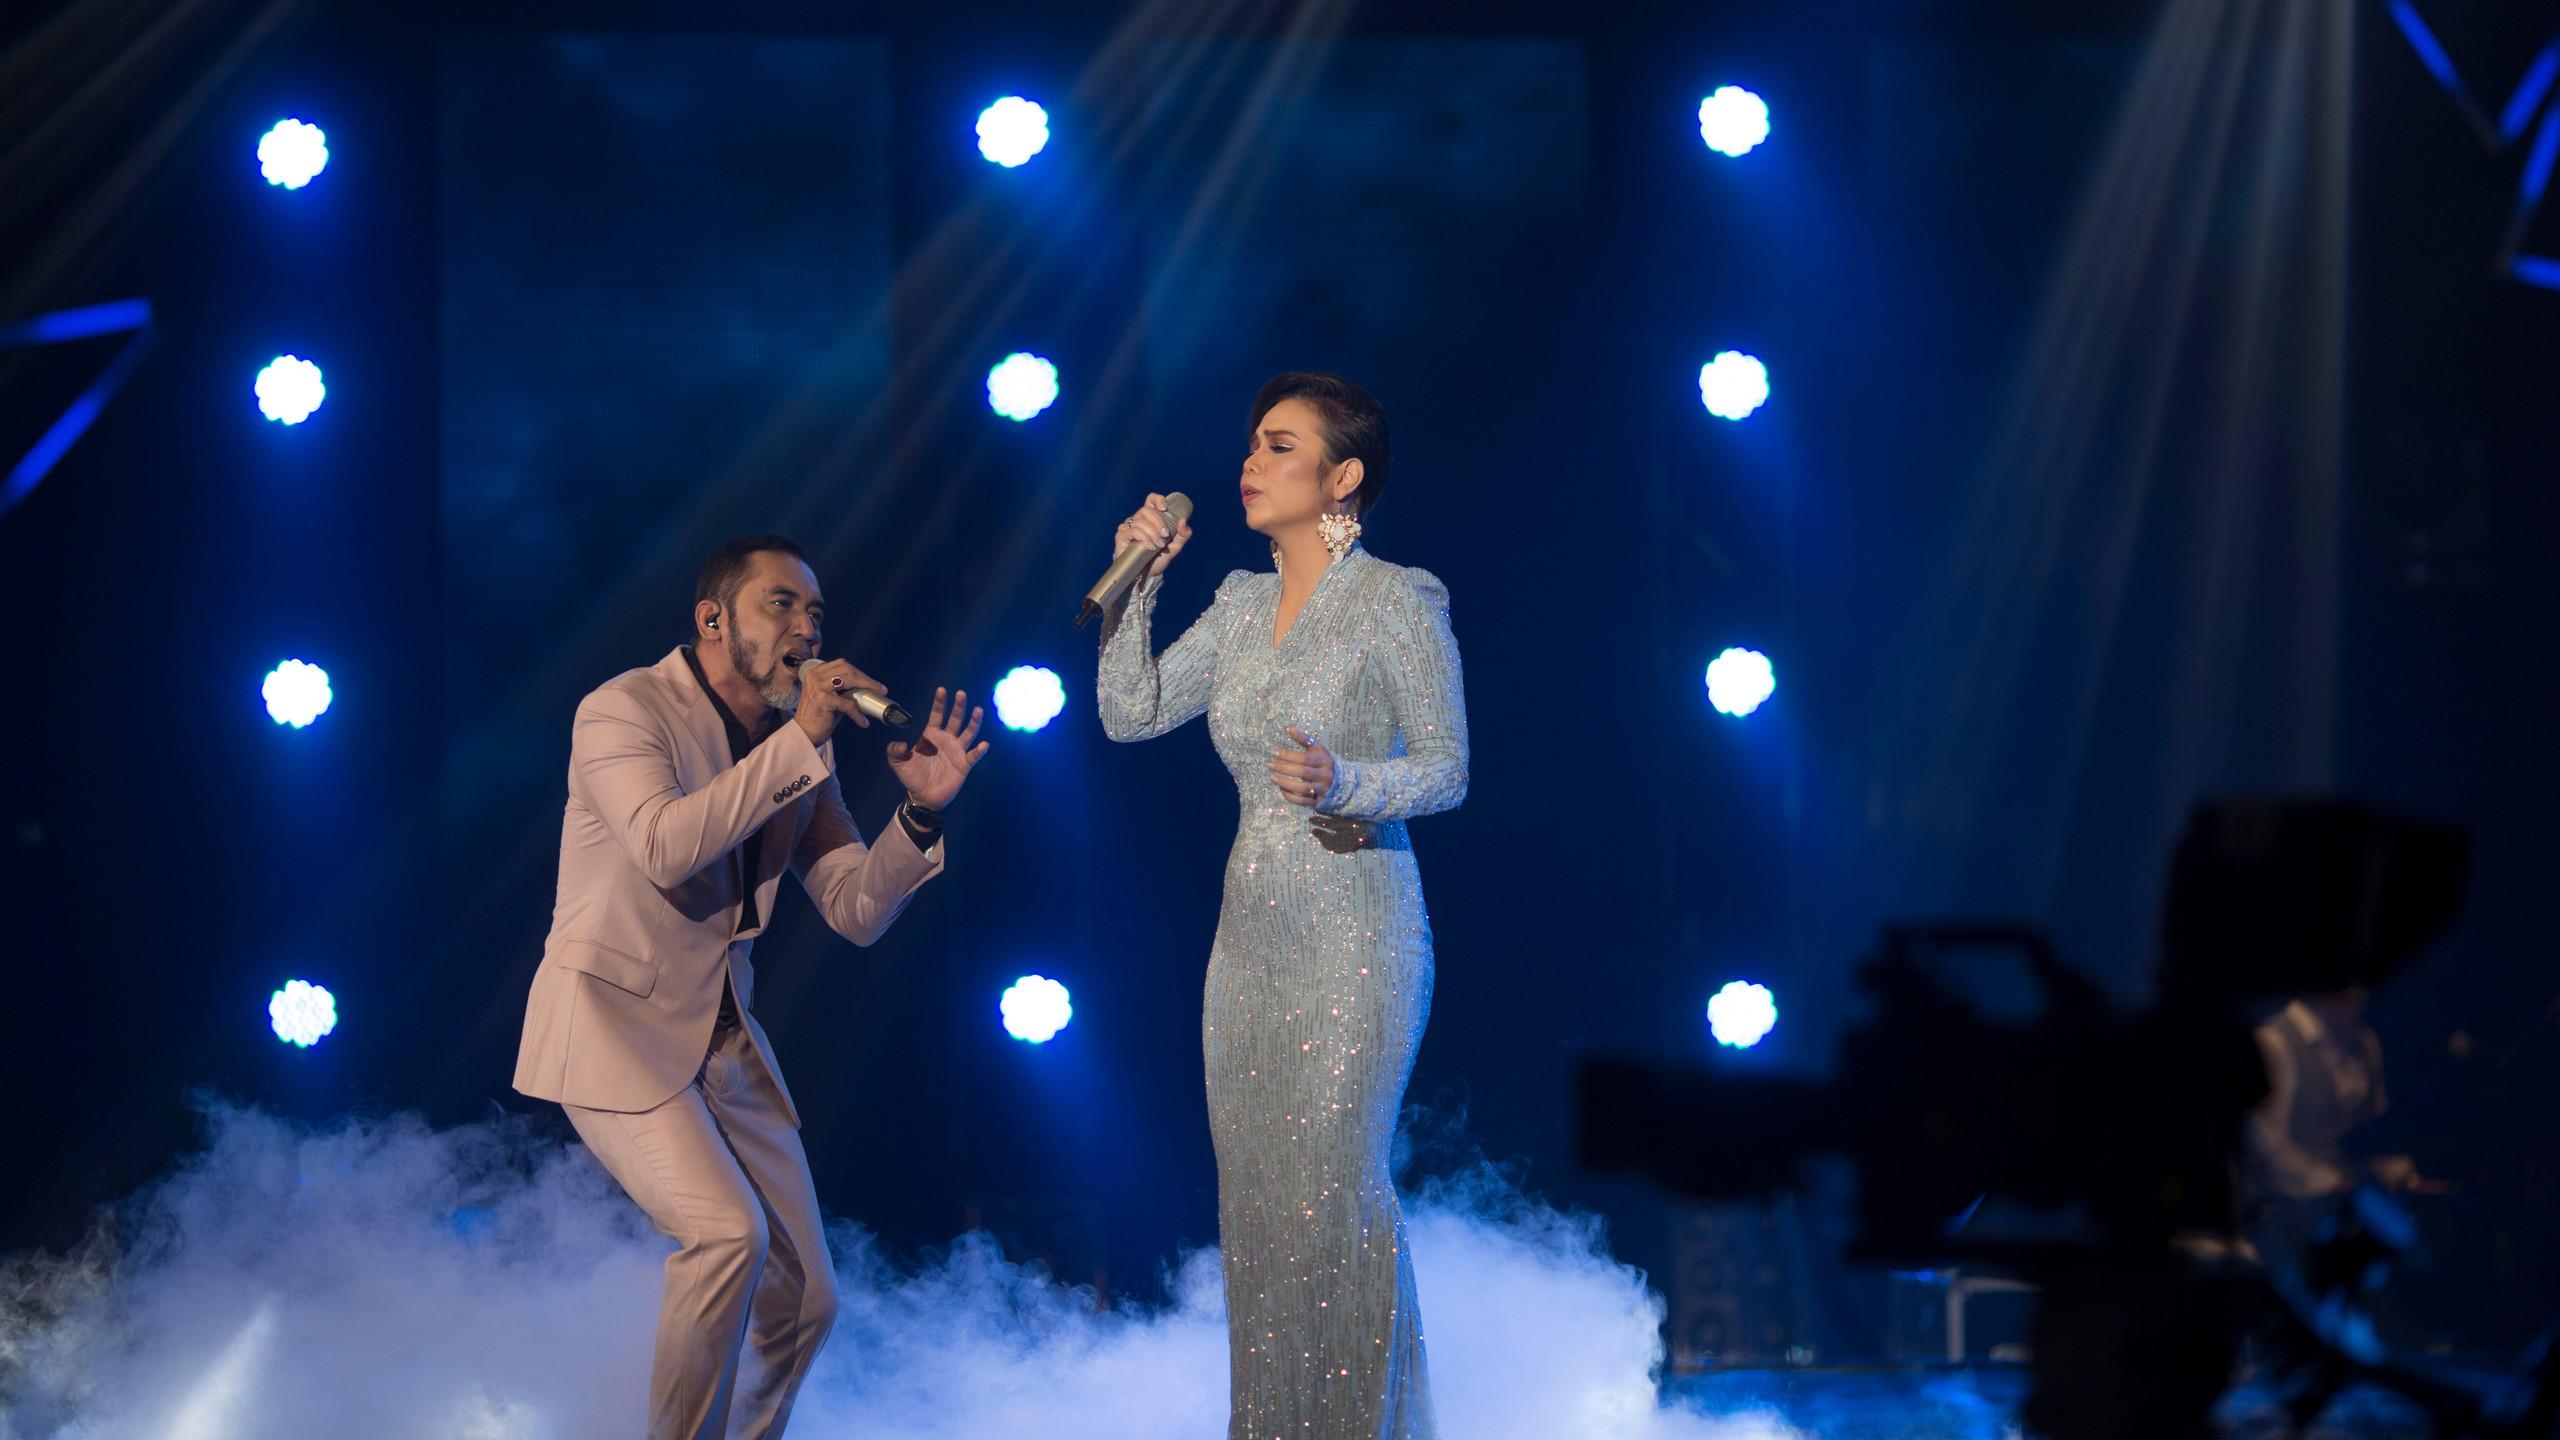 AJ dan Faradhiya